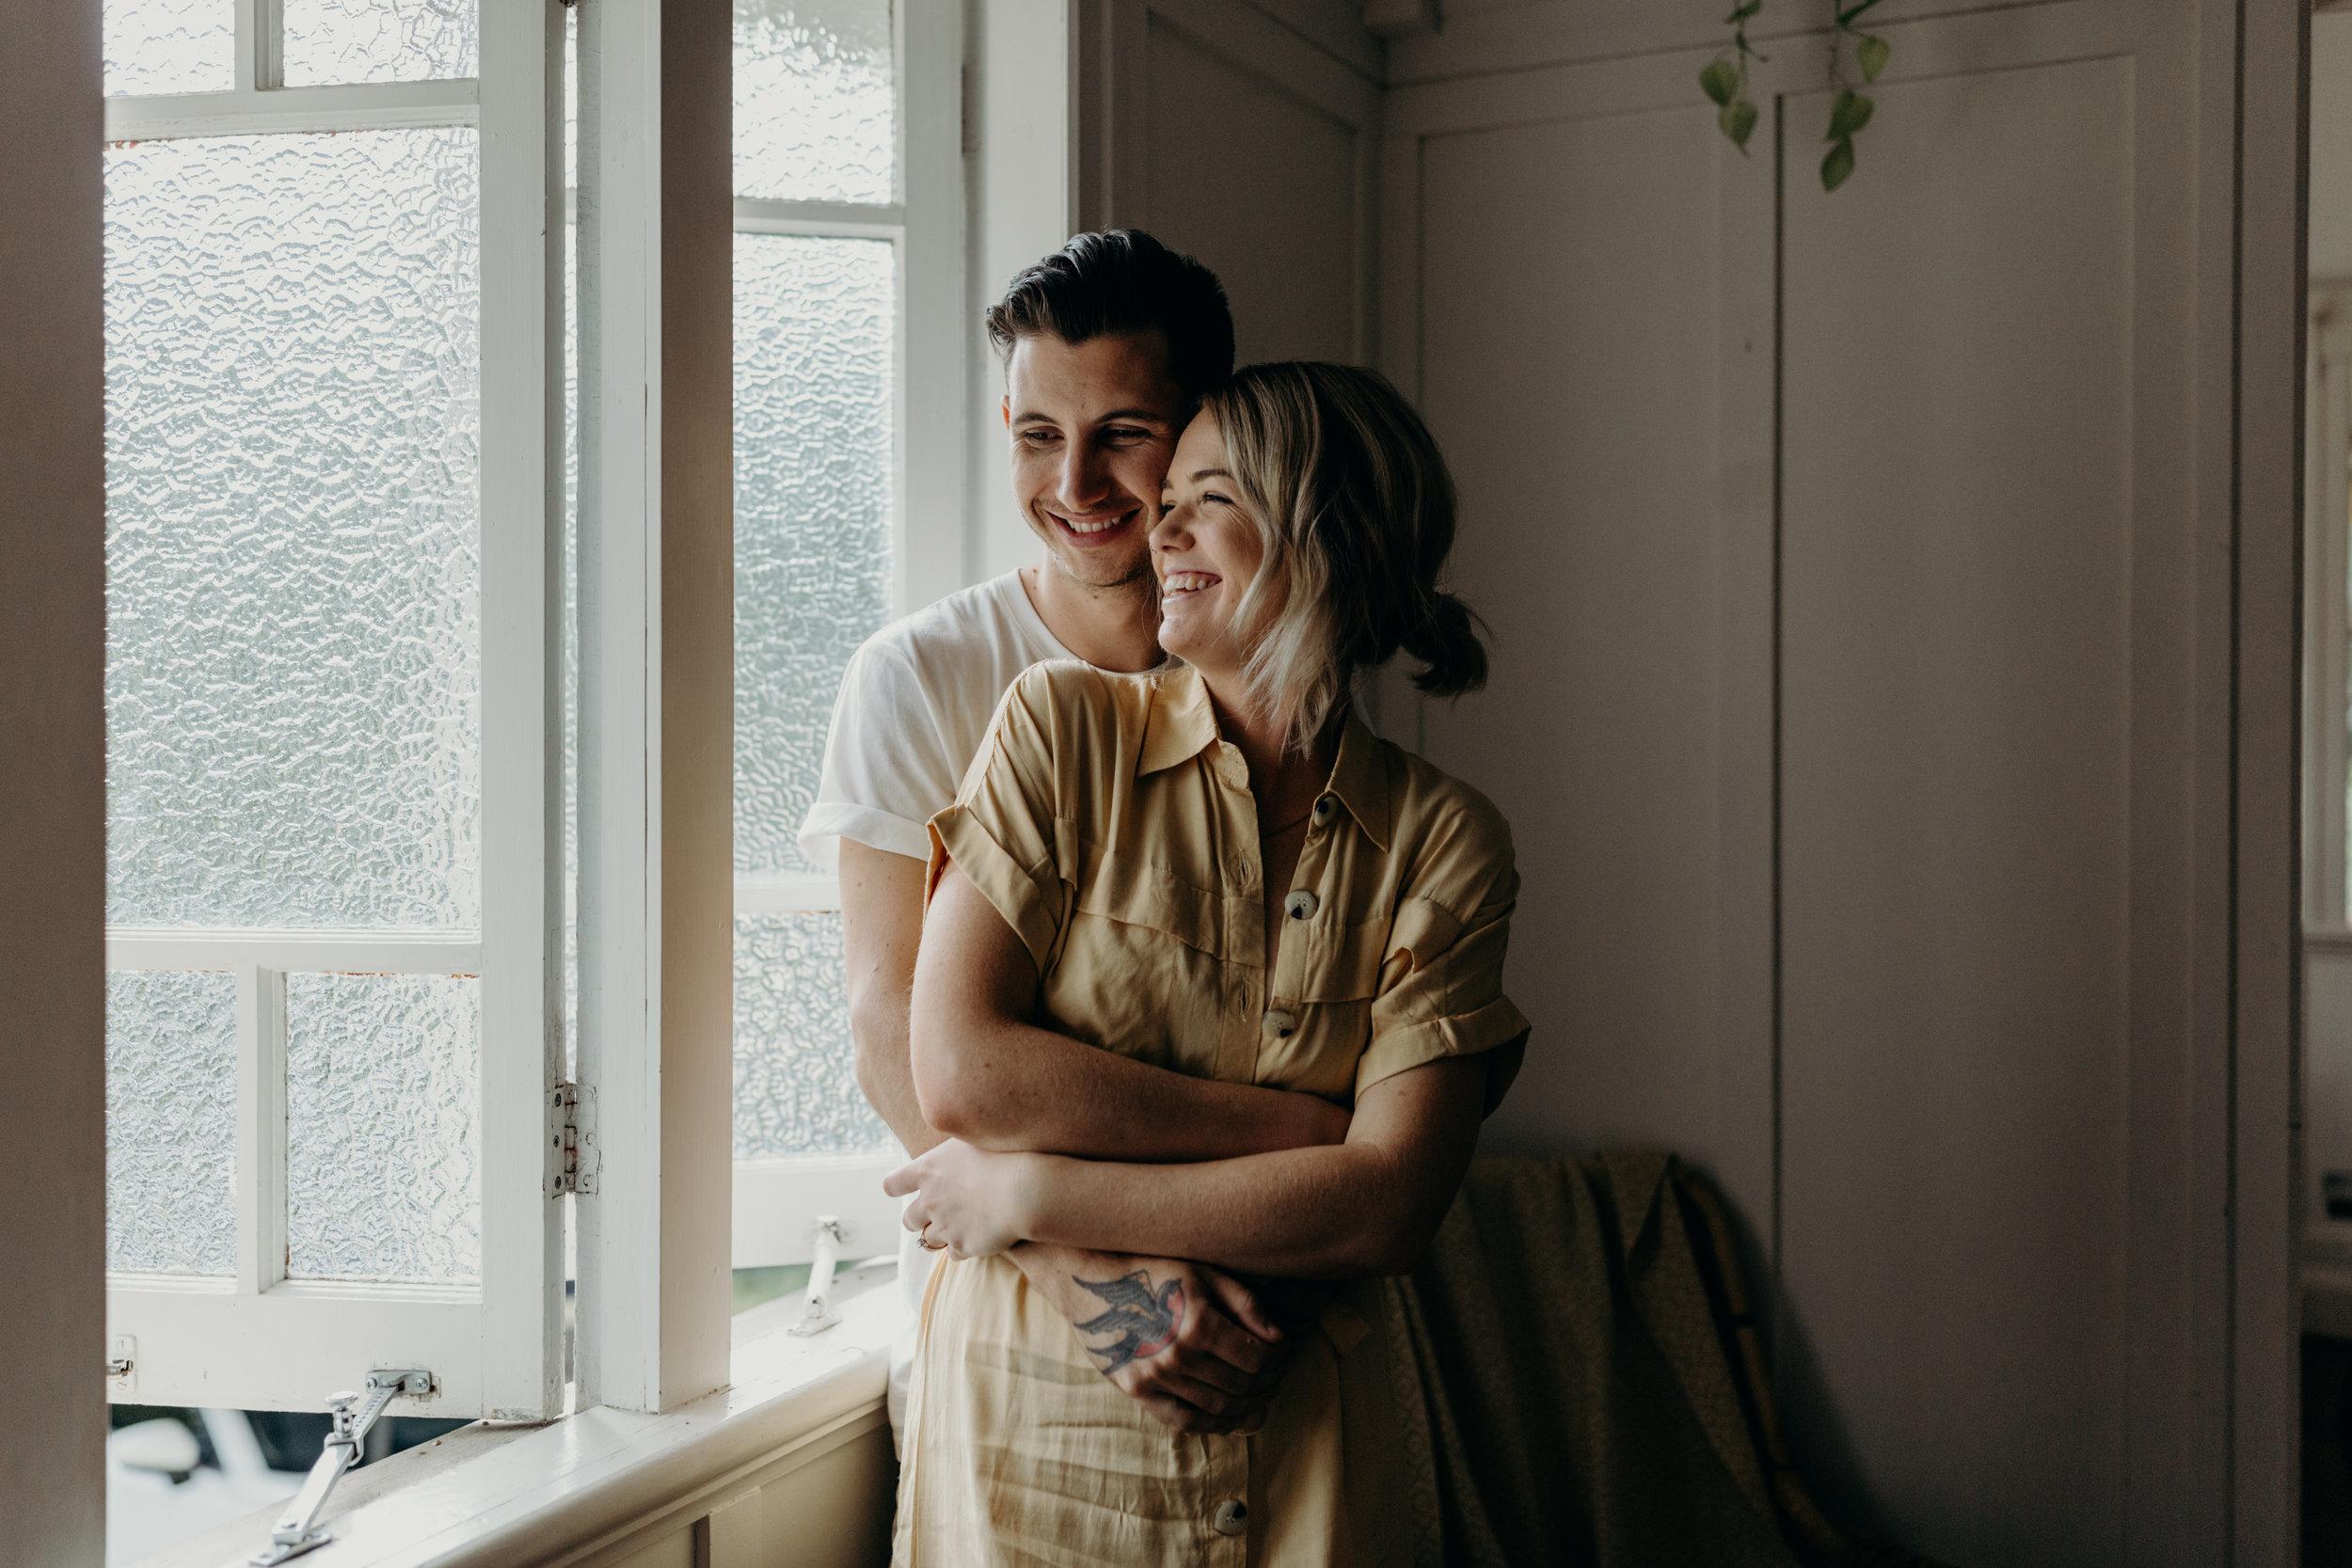 Emily Jane Photographer 2019 - Brisbane - Mim + Jordan (web)-24.jpg